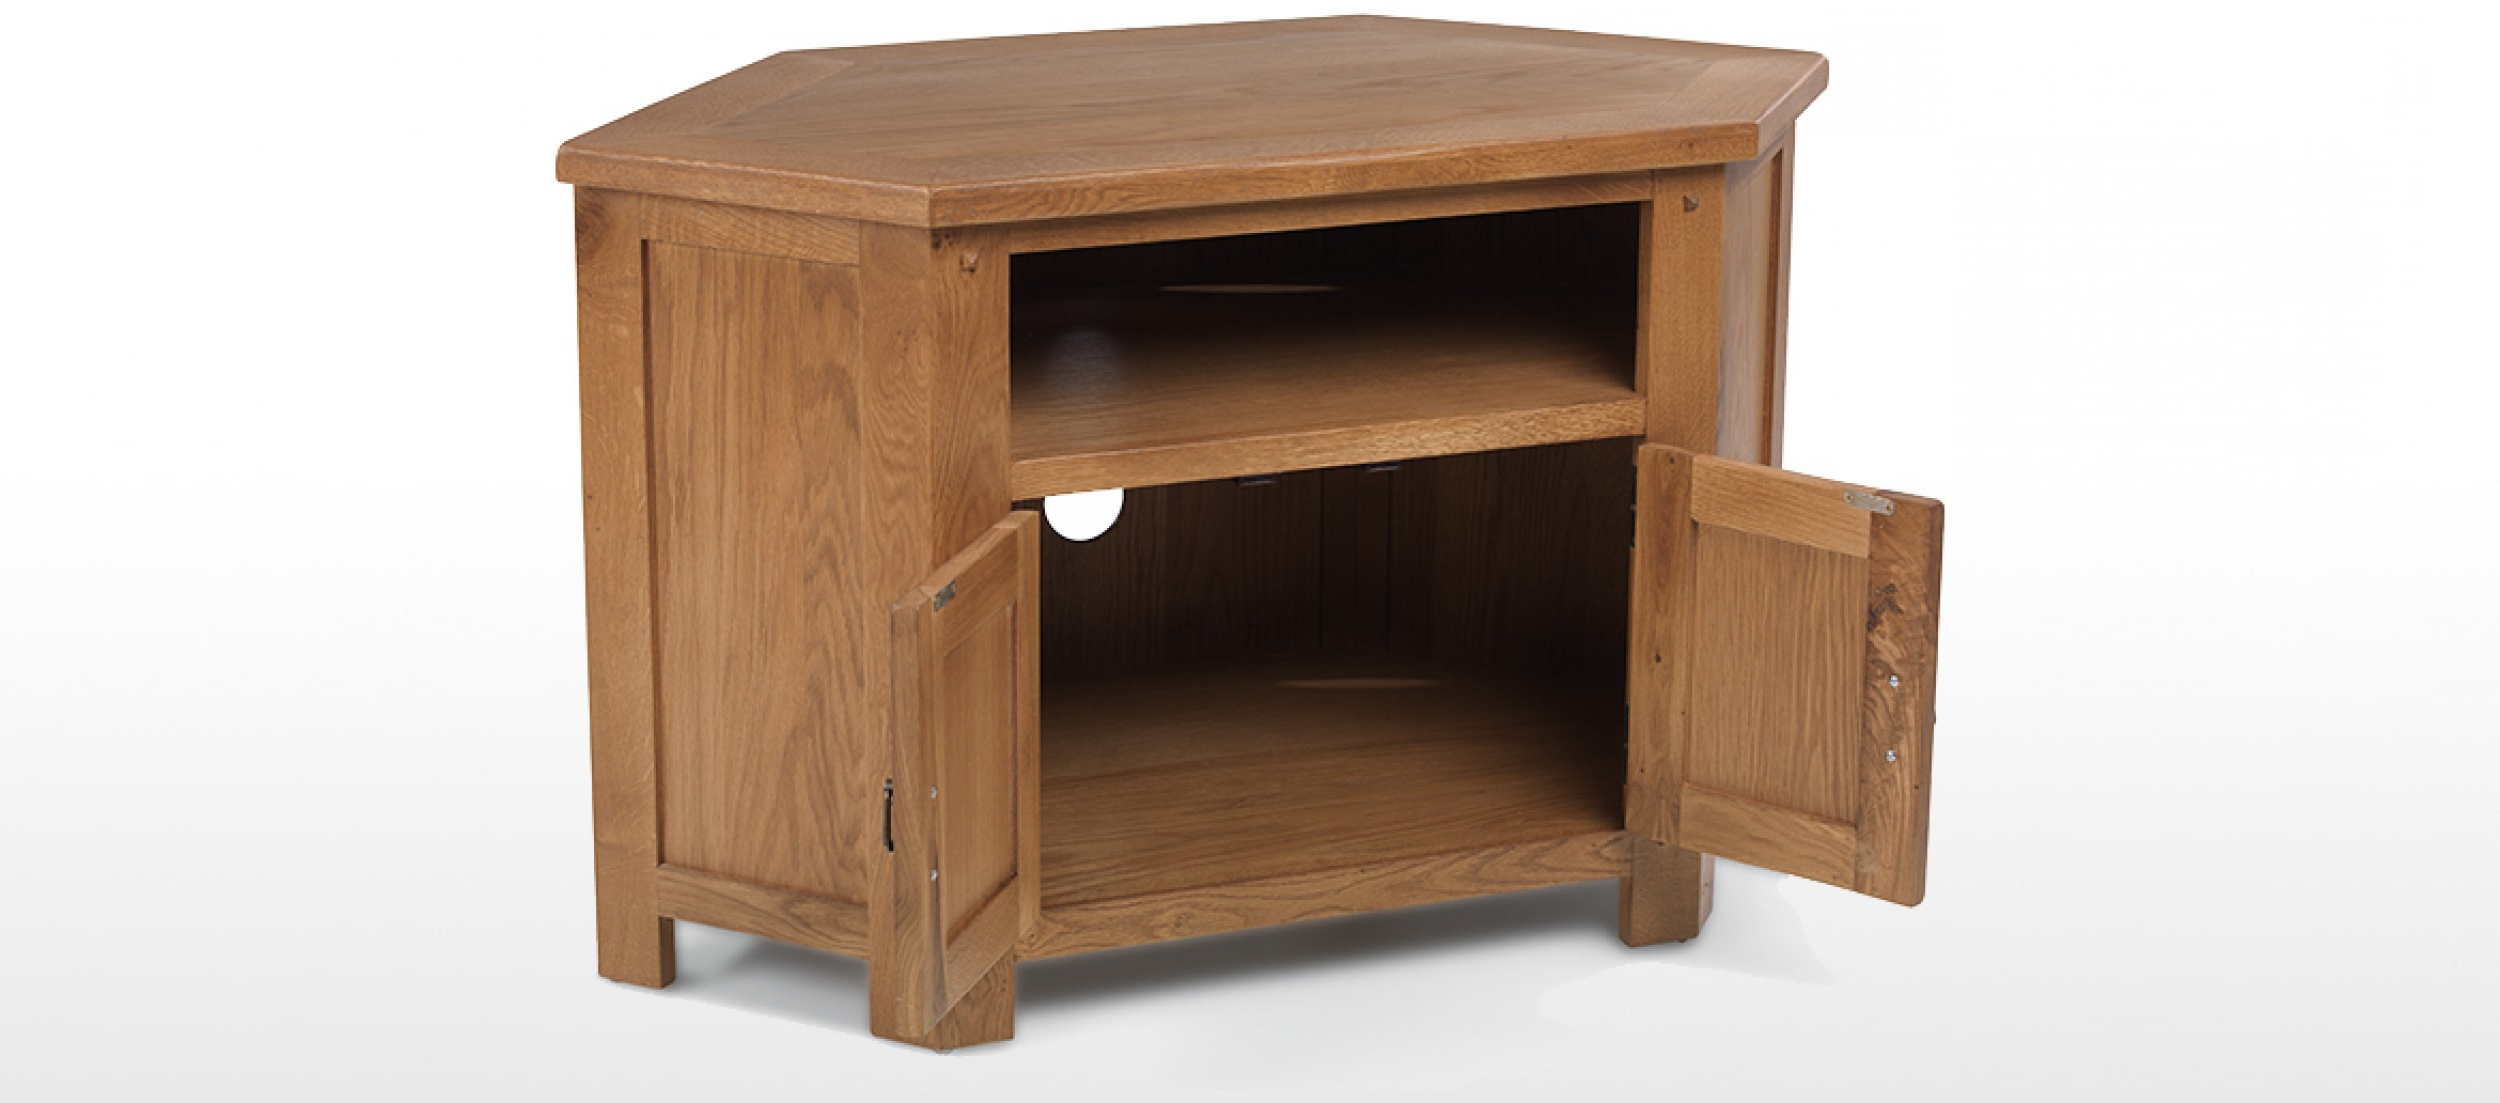 Favorite Rustic Oak Tv Stands Throughout Rustic Oak Corner Tv Cabinet (View 5 of 20)